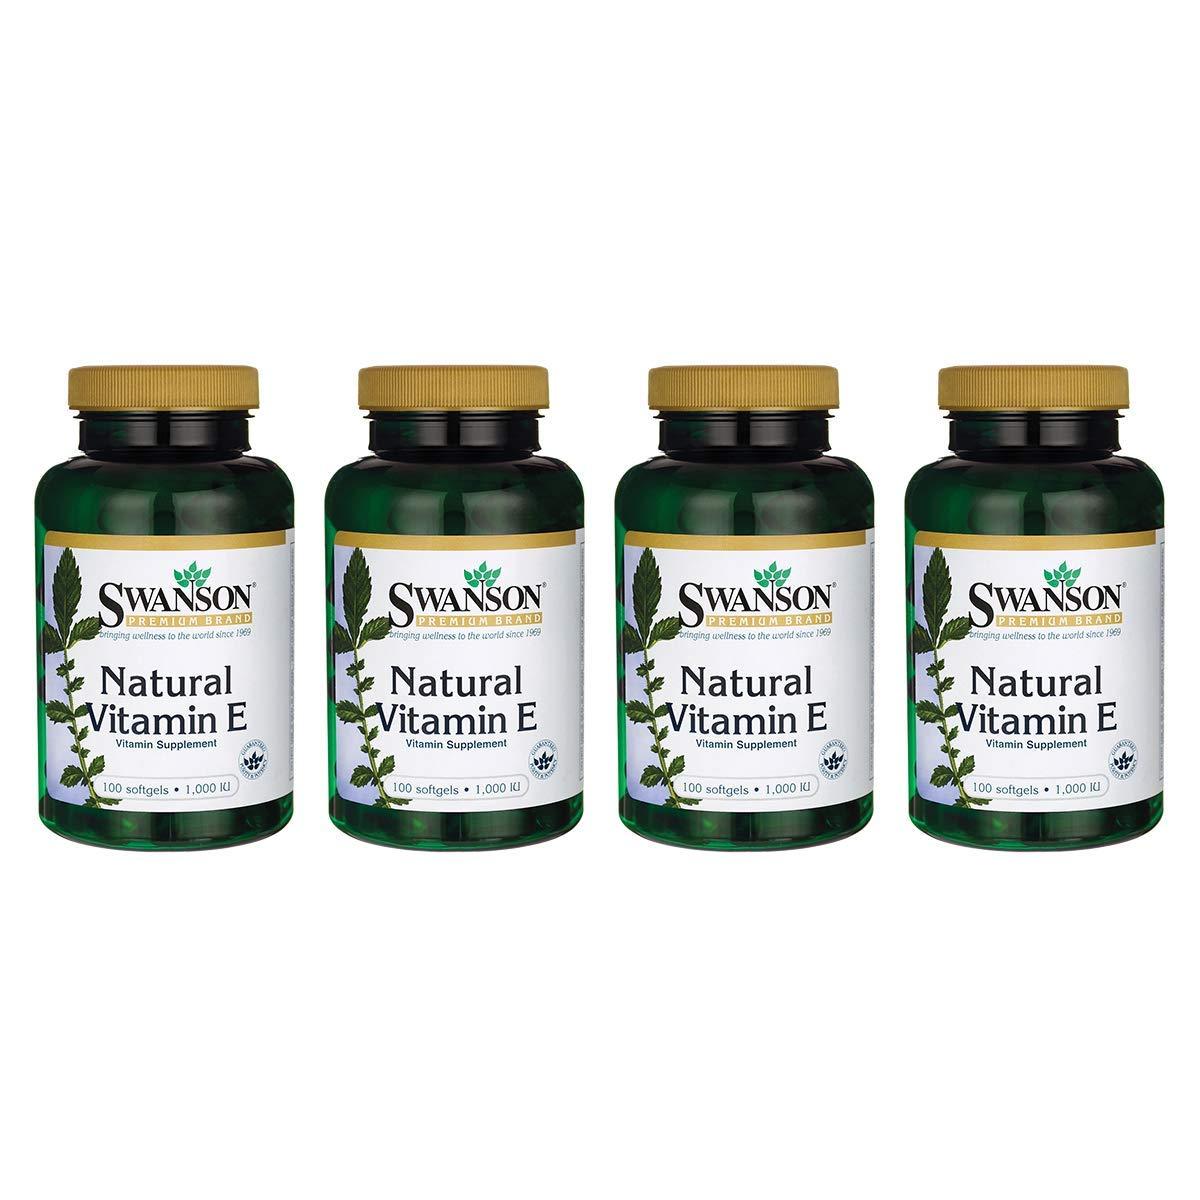 Swanson Natural Vitamin E 1000 Iu (671.10 Milligrams) 100 Sgels (4 Pack) by Swanson